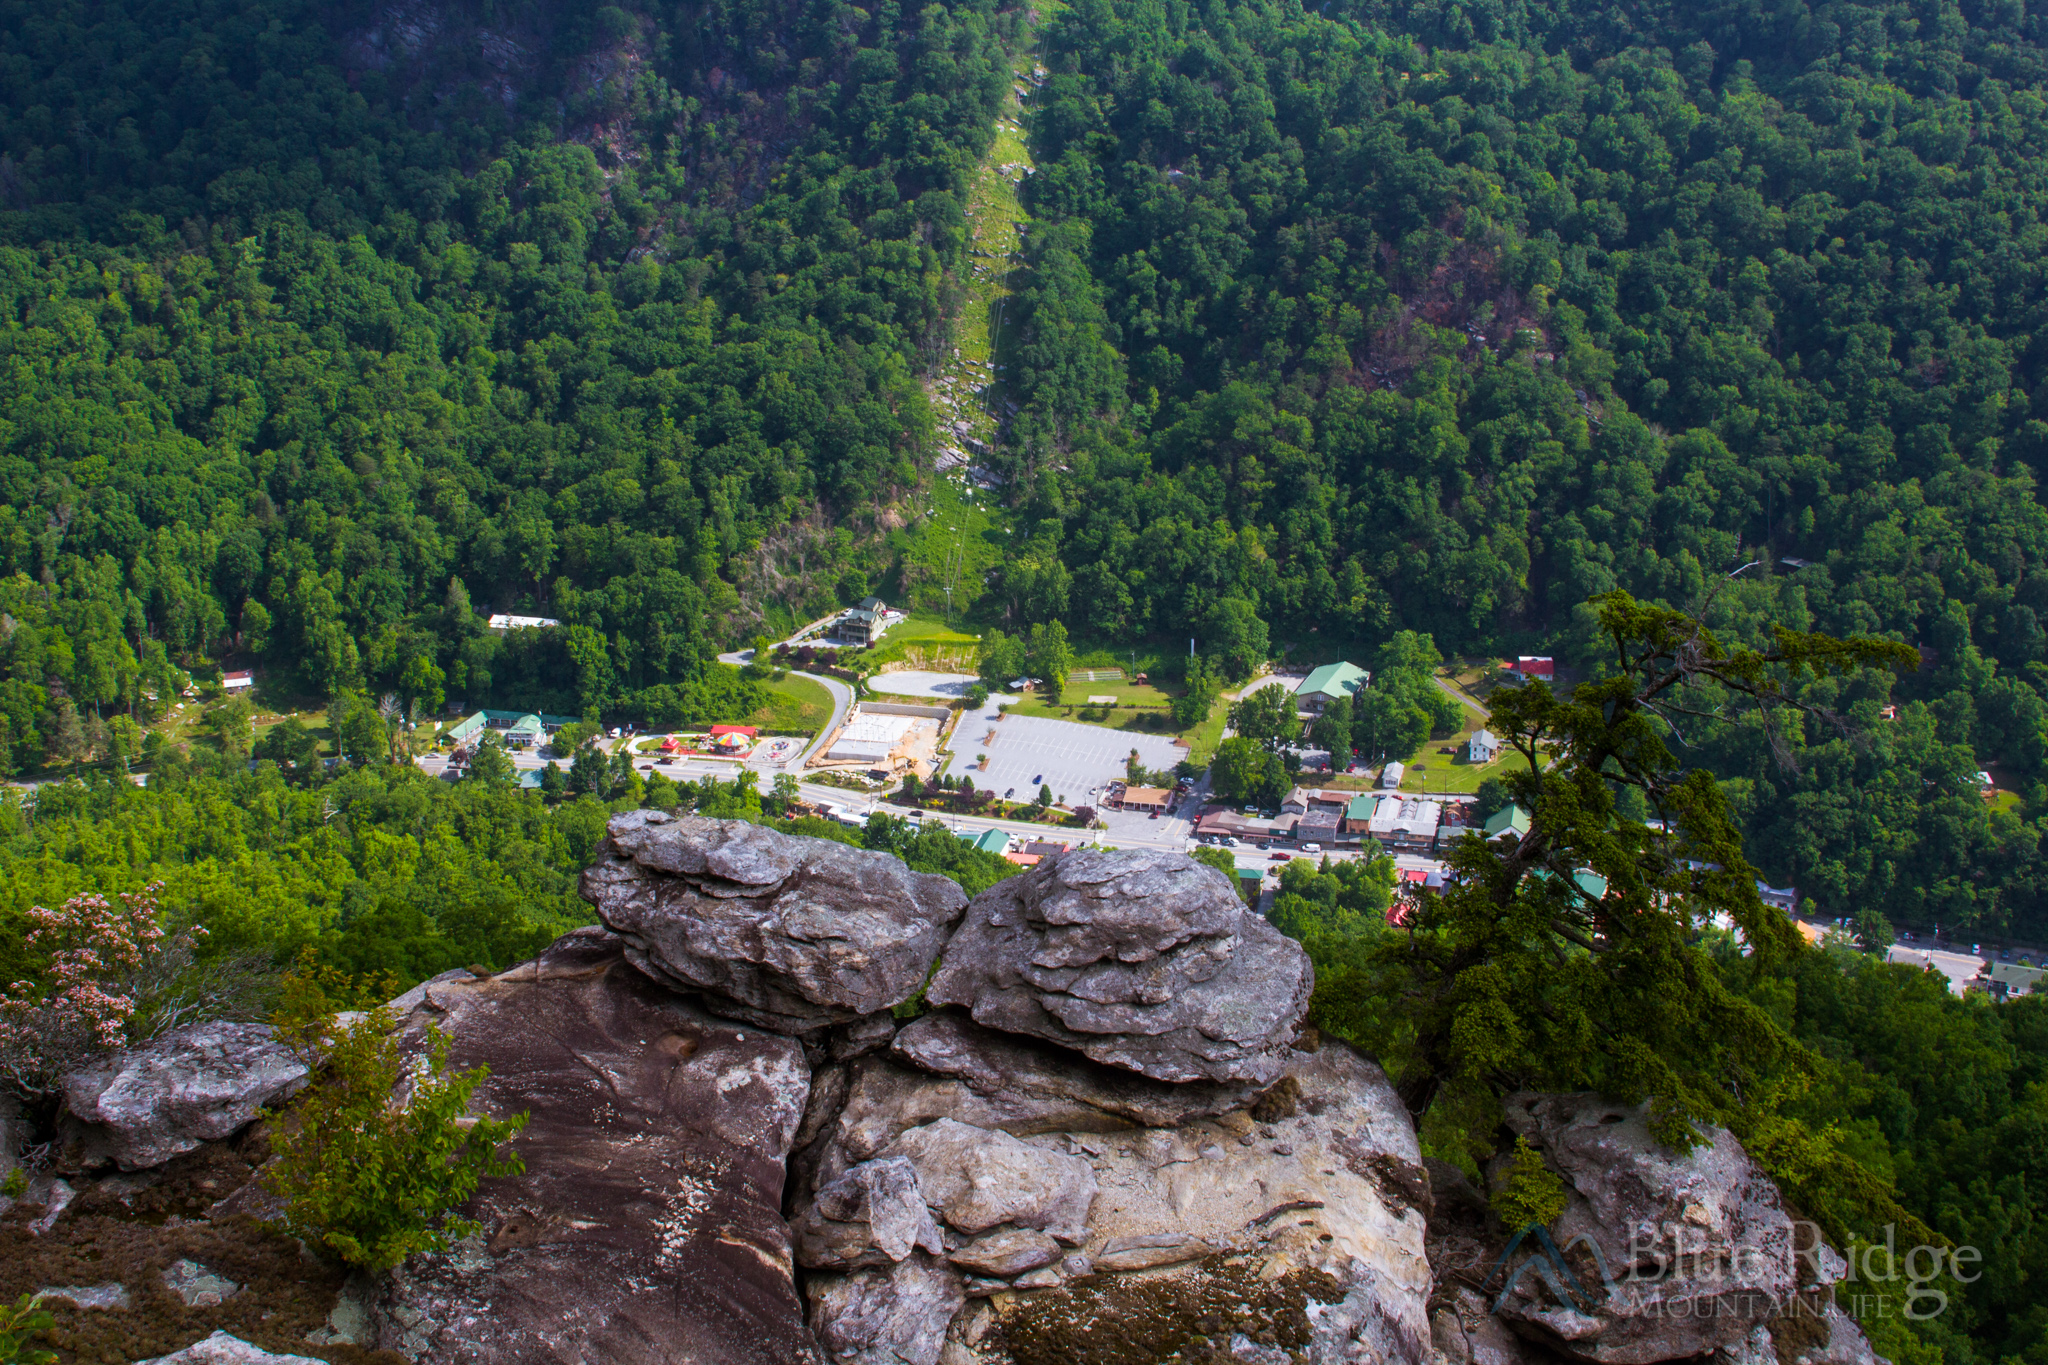 View of Chimney Rock Village from Chimney Rock